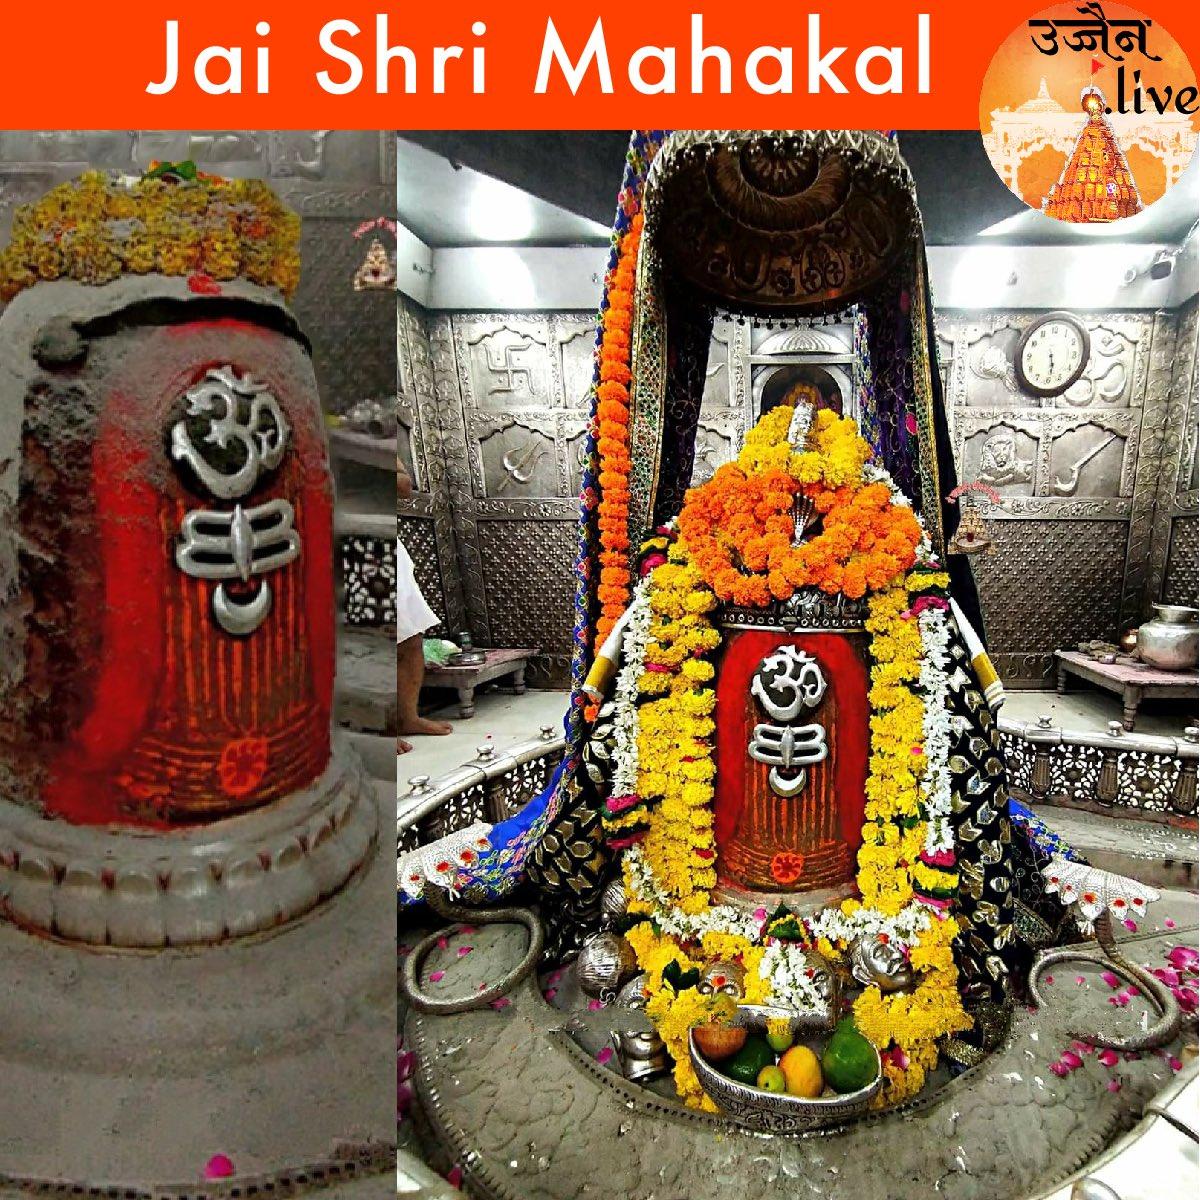 Sept 19: Bhasma Aarti darshan of Shree #Mahakaleshwar #Ujjain #shiv #shiva #bholenath #mahadev #हर_हर_महादेव #jaibholenath #jaimahakal #om #omnamahshivay #harharmahadev  #mahakal #goodmorning #SaturdayVibes  #Incredibleindia  @HinduTempleLive https://t.co/lqXheIc7KW